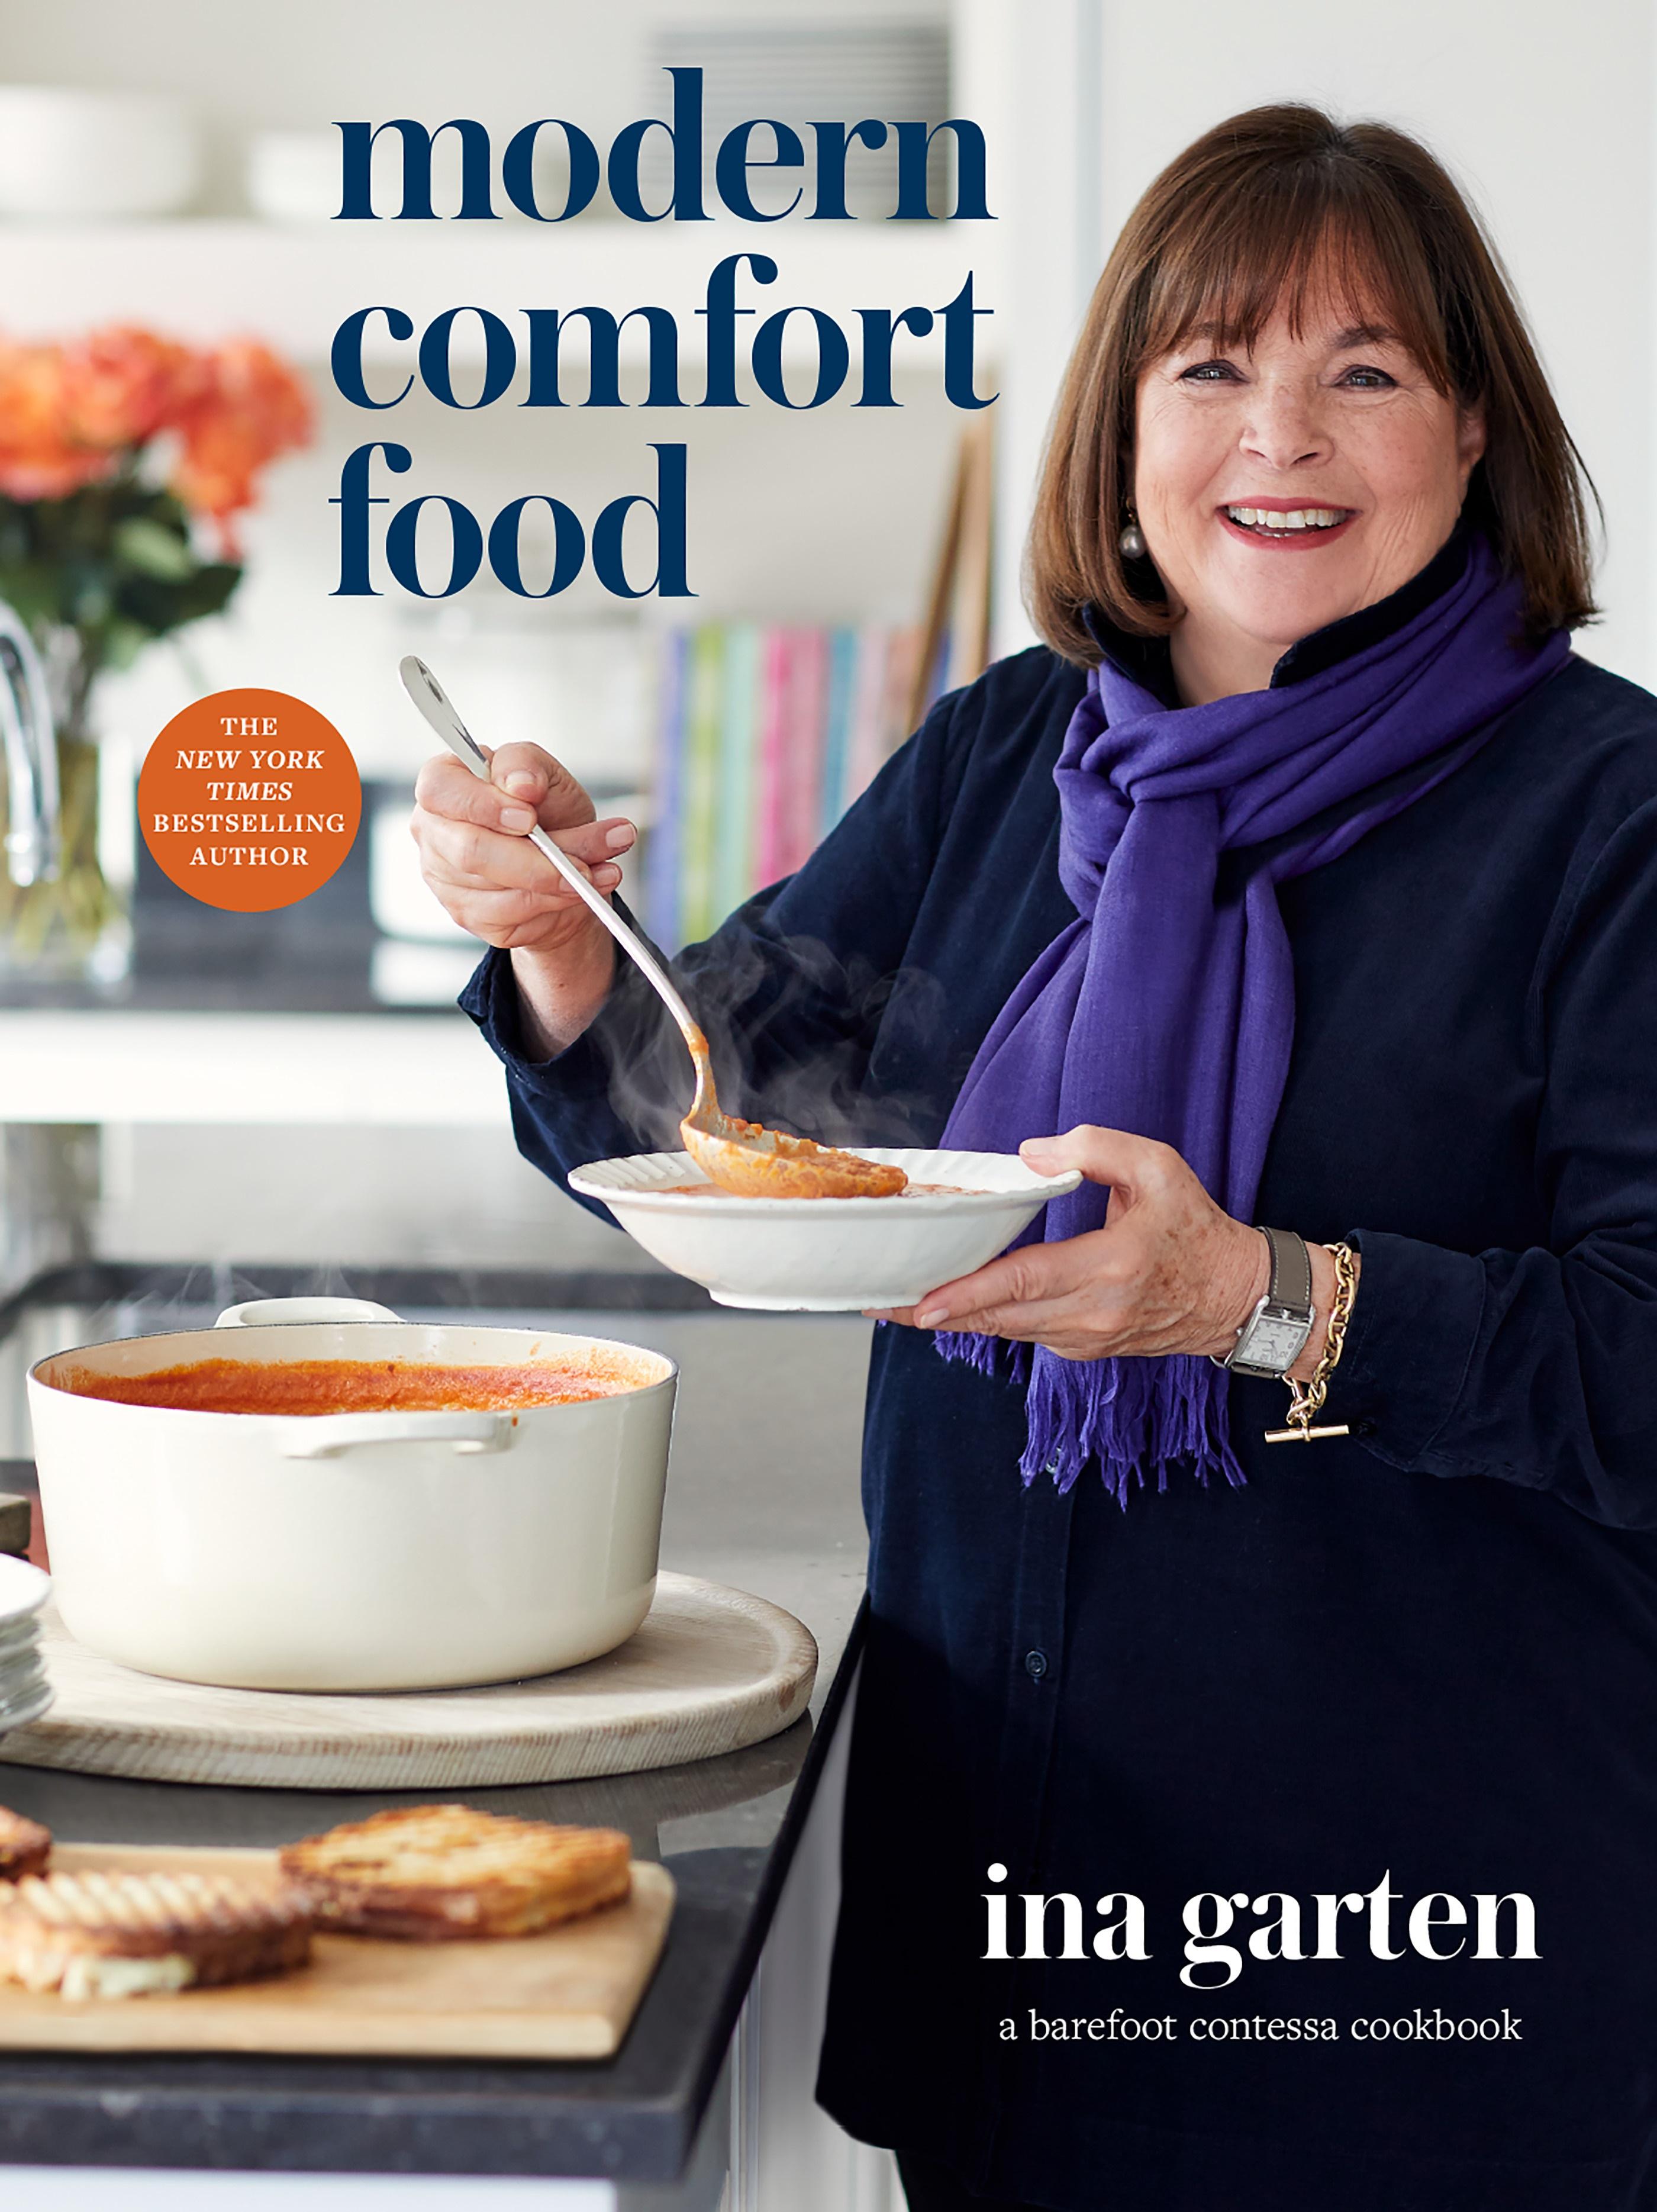 Barefoot Contessa's Modern Comfort Food